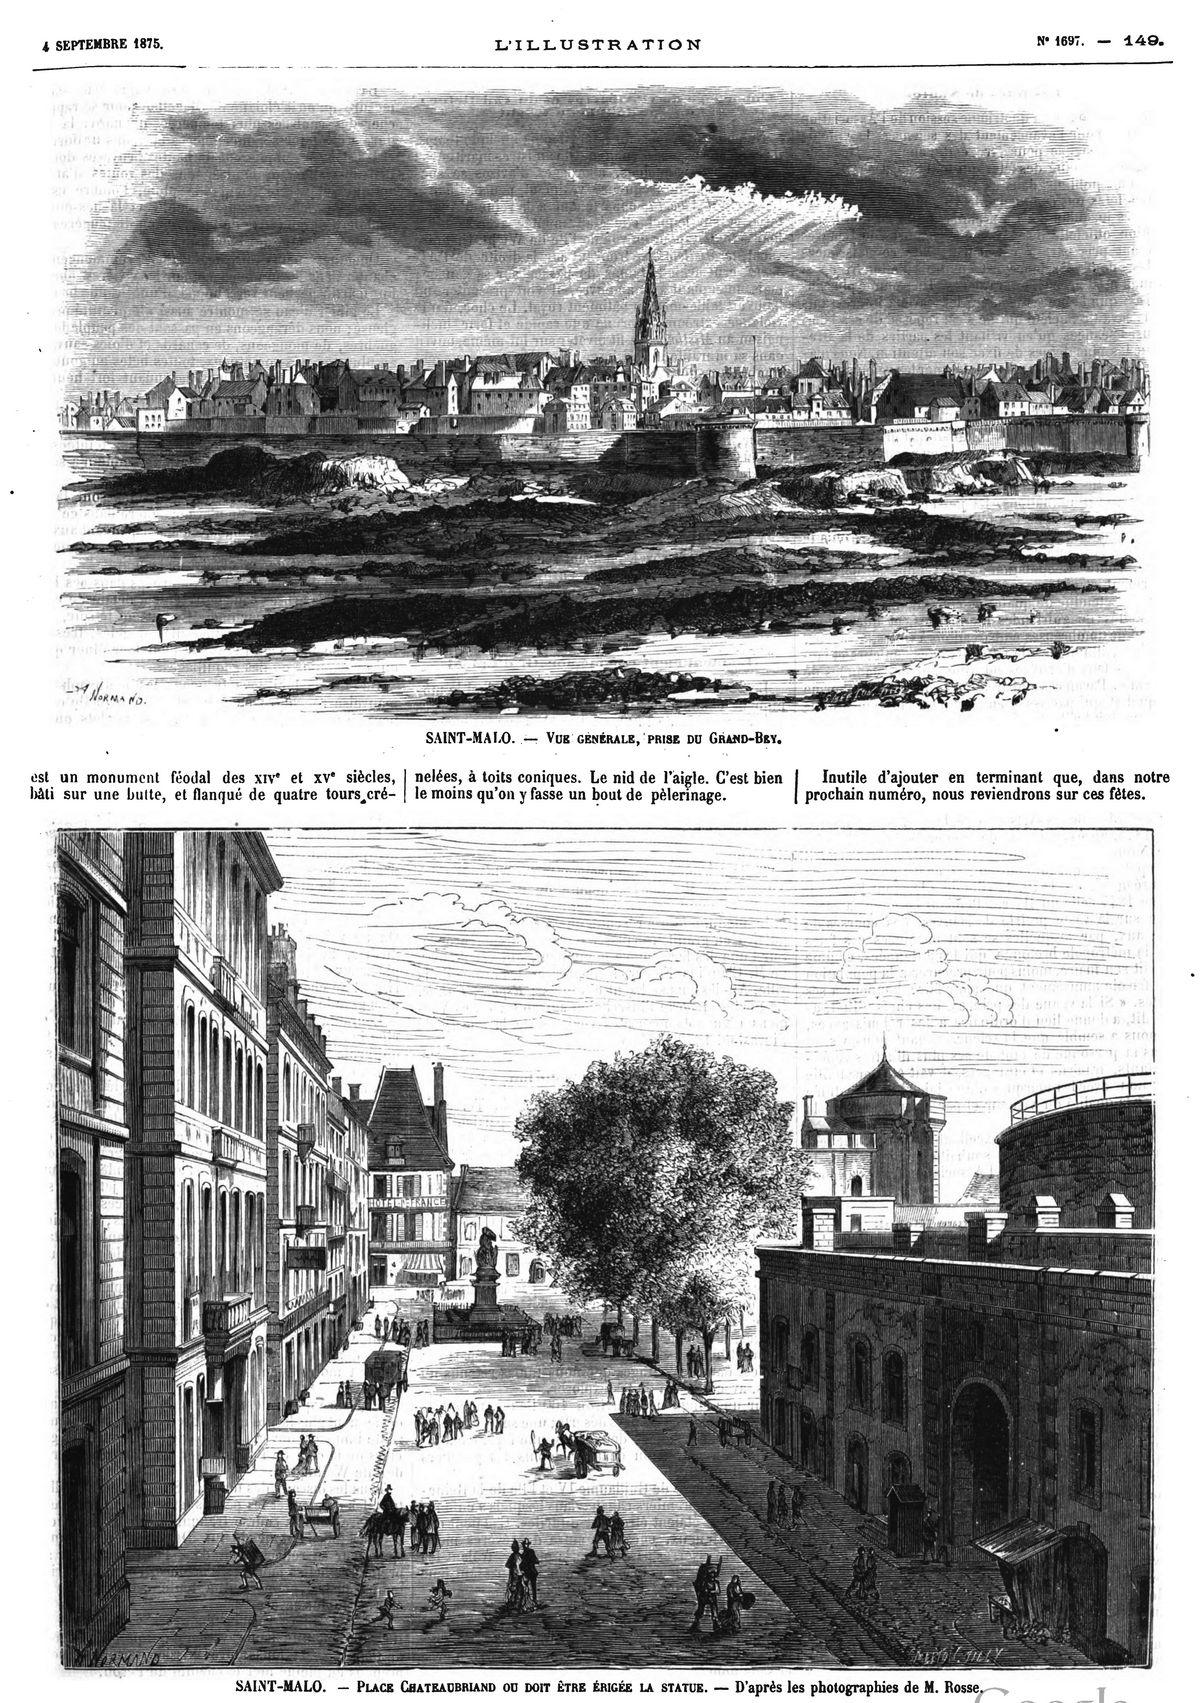 Saint-Malo (4 gravures)